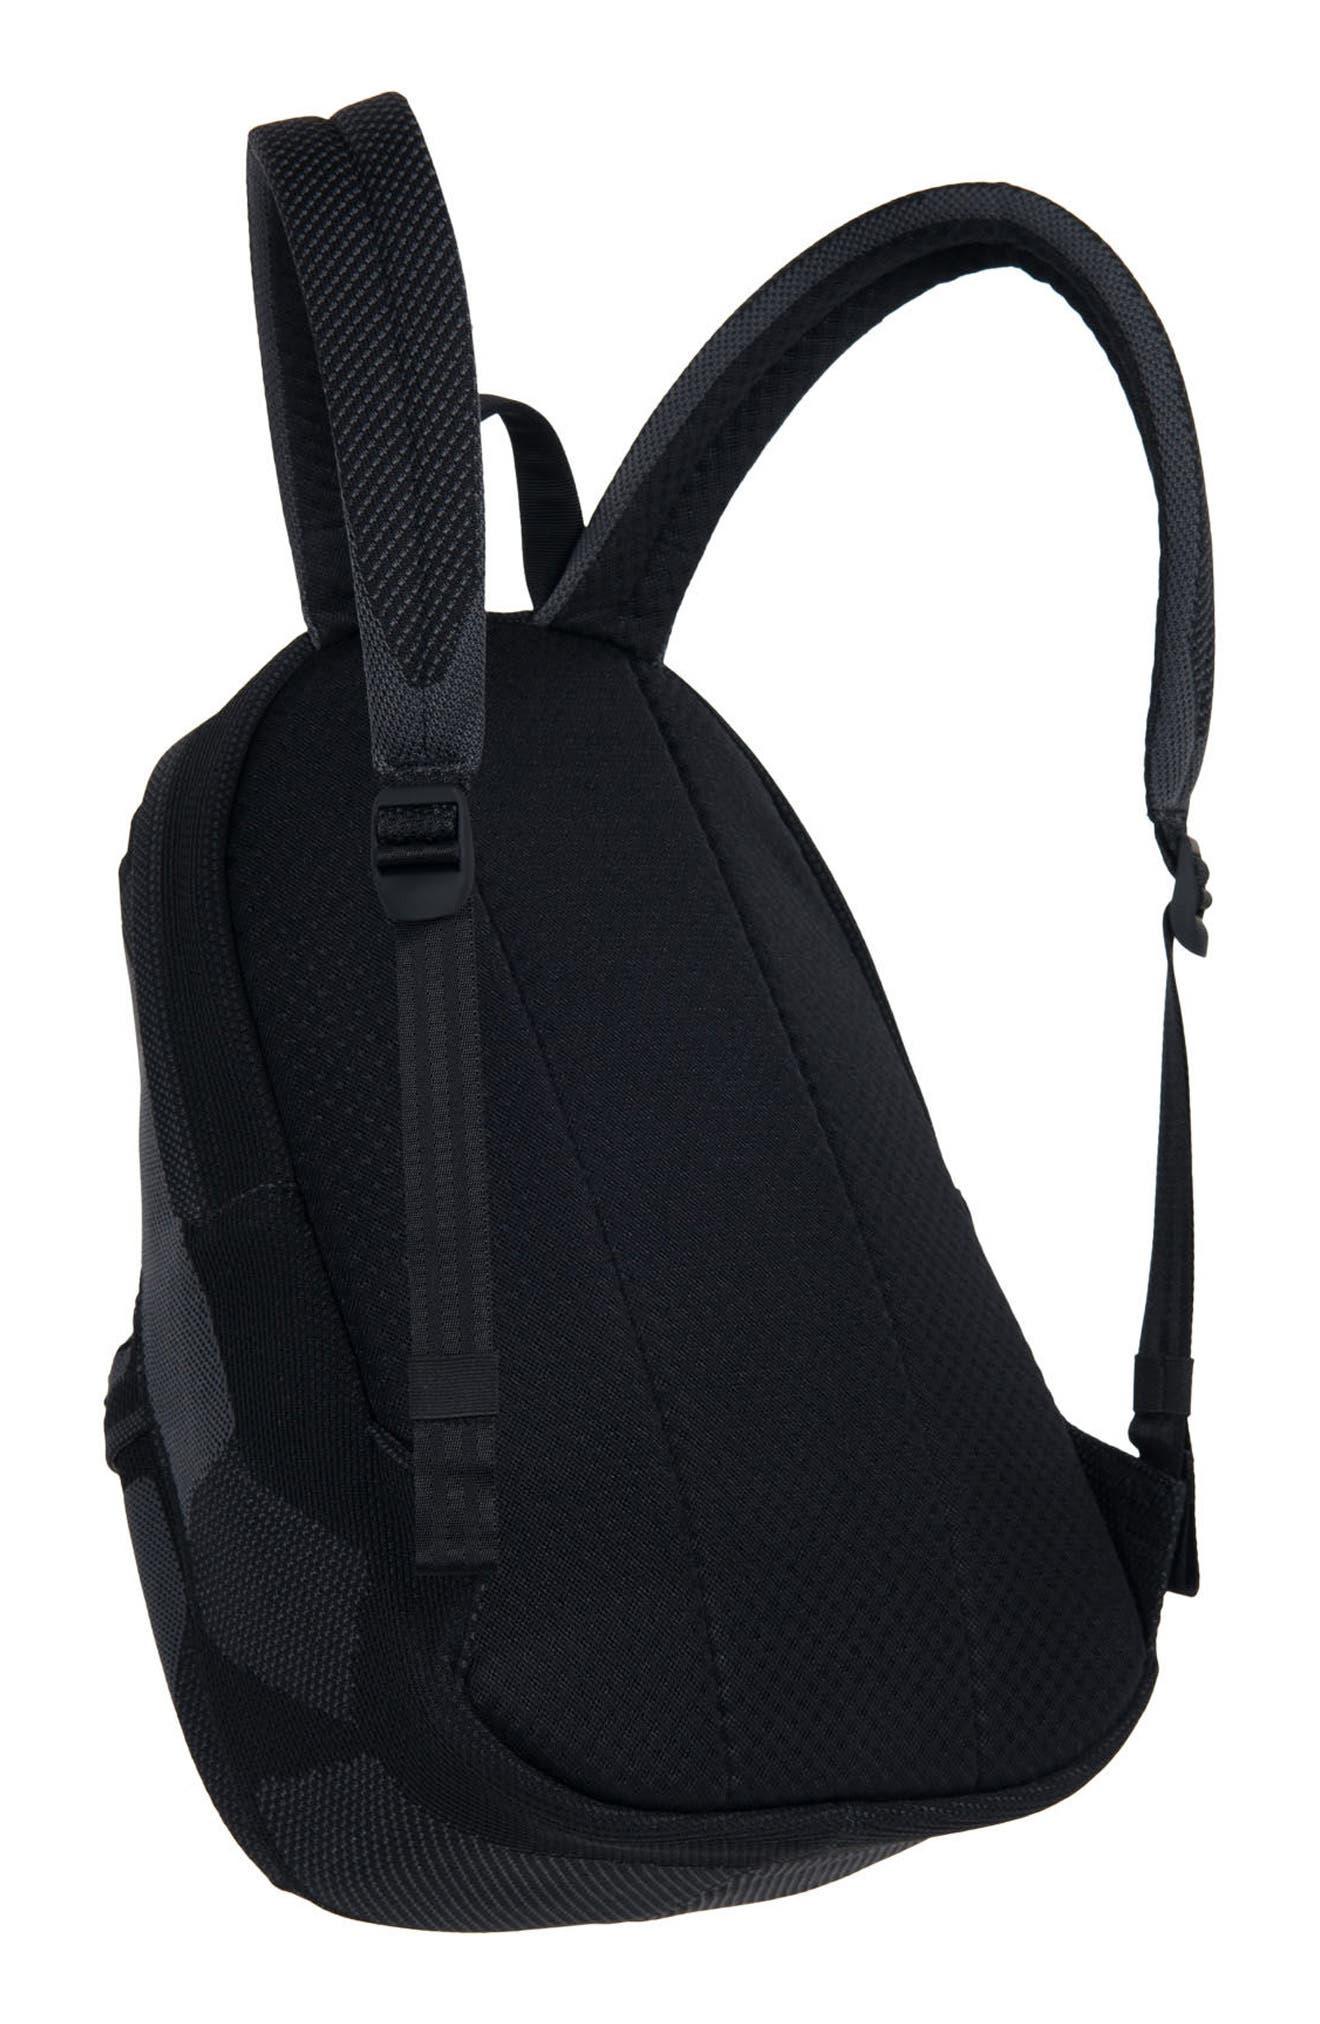 Apex Lawson Backpack,                             Alternate thumbnail 2, color,                             Black Beauty/ Dark Shadow